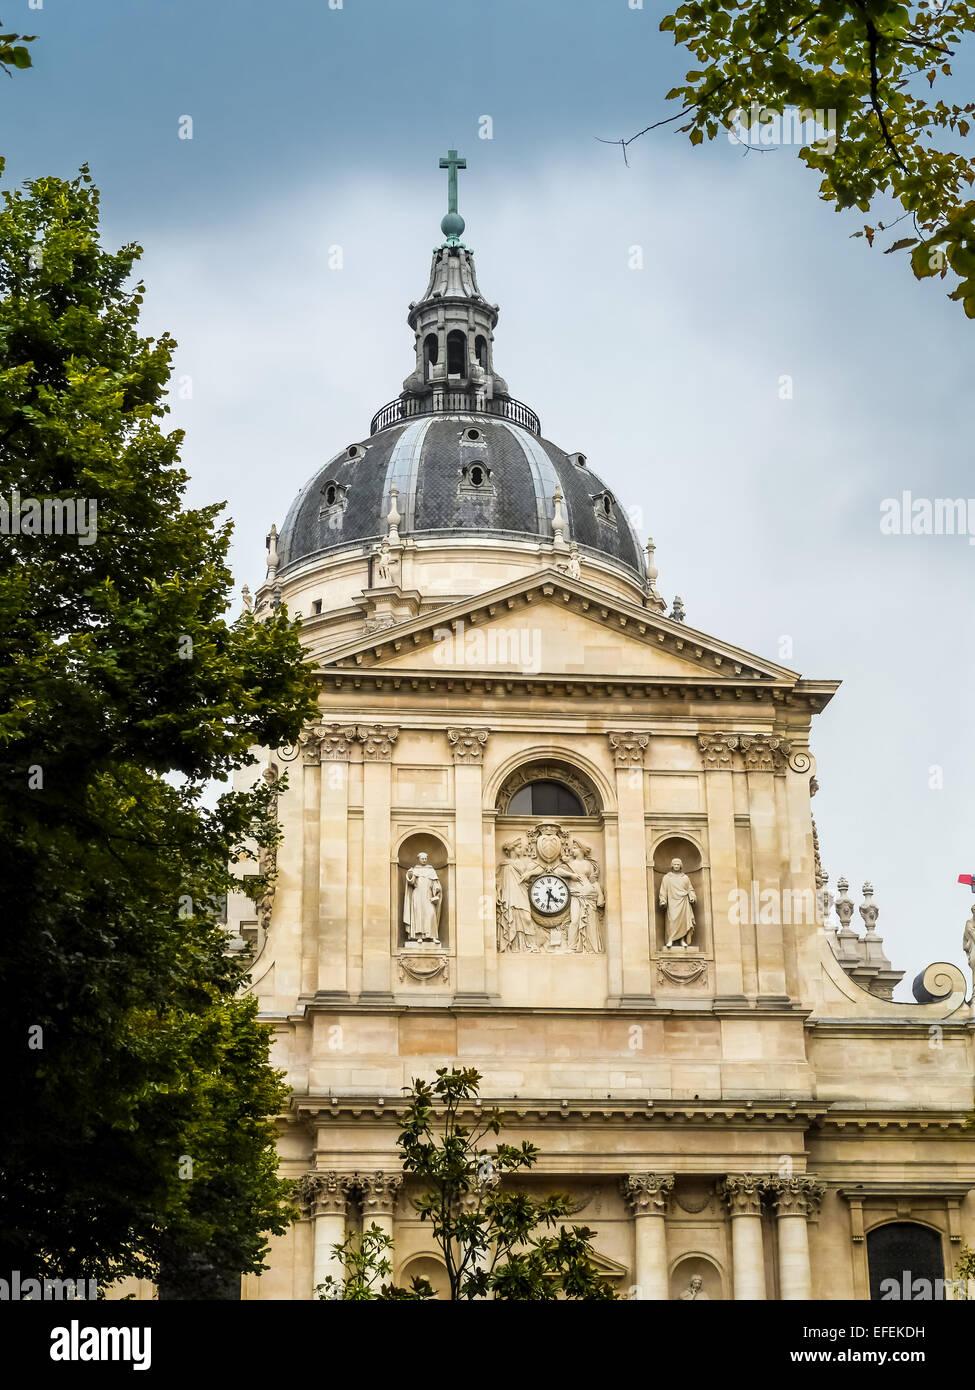 Berühmte Universität Sorbonne in Paris, Frankreich Stockbild